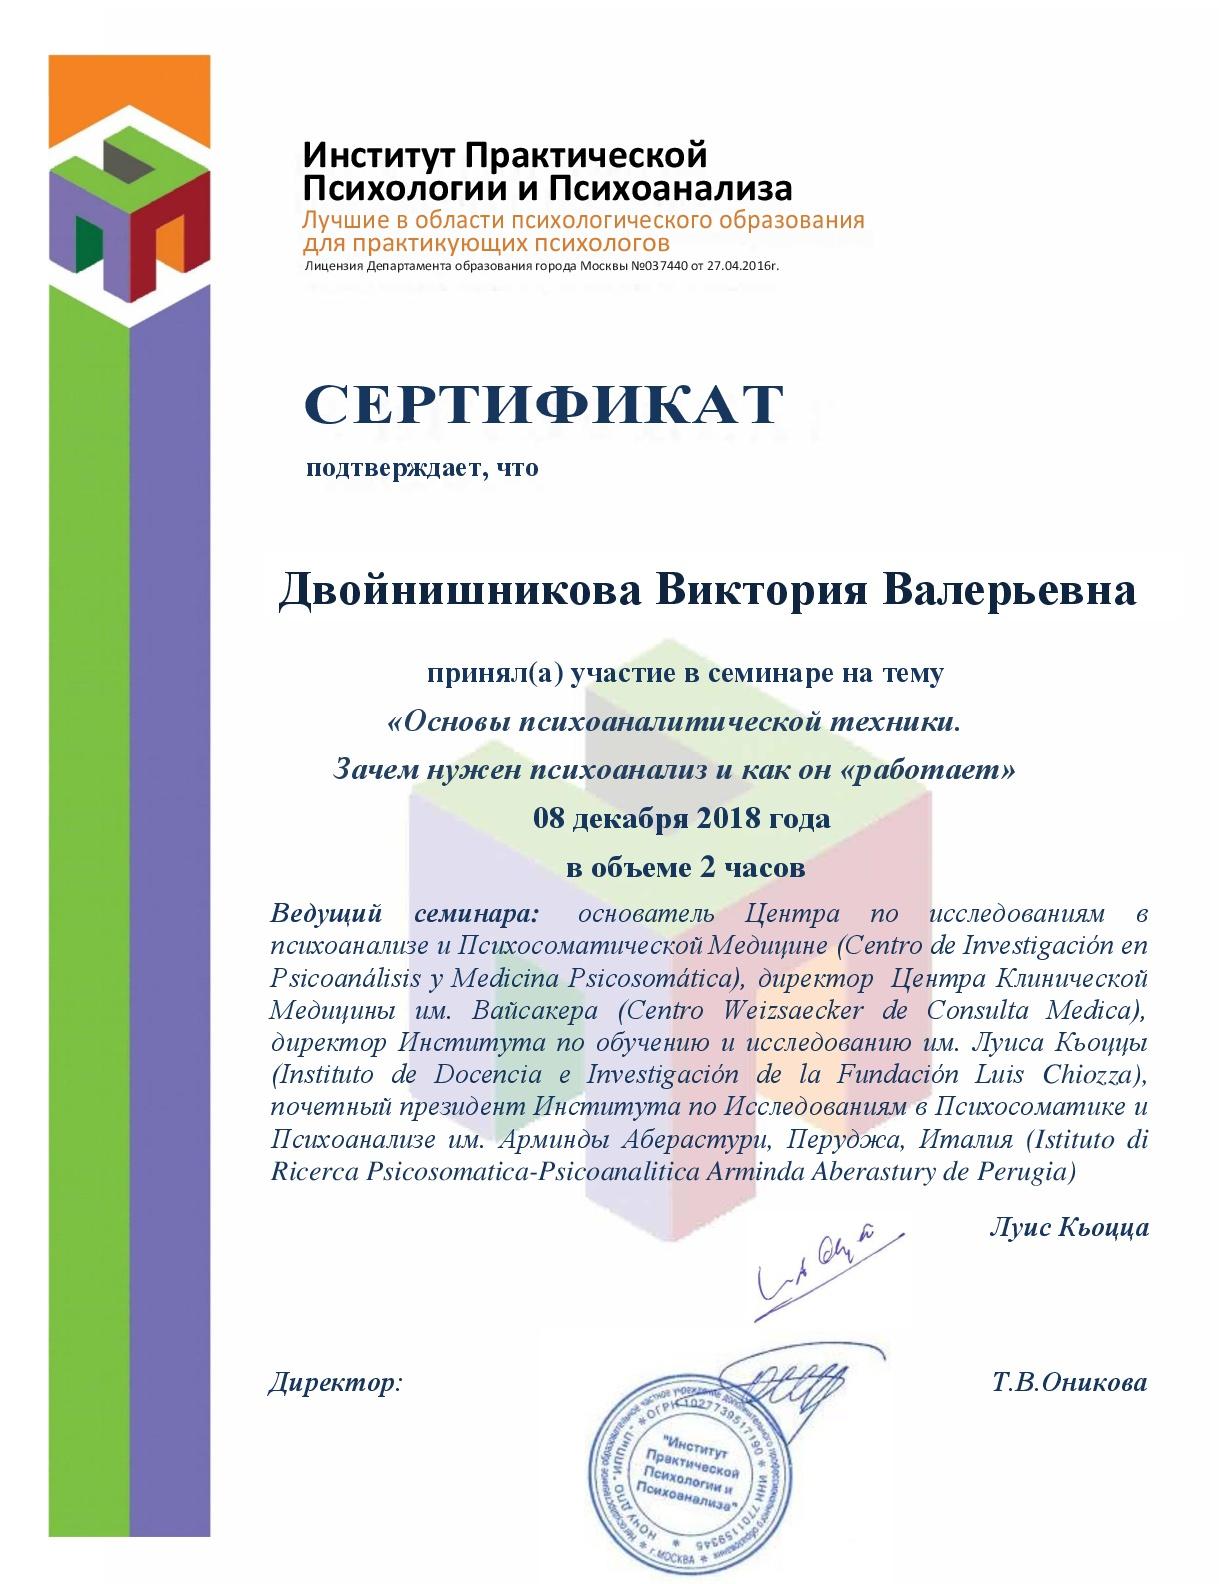 сертификат ИППП